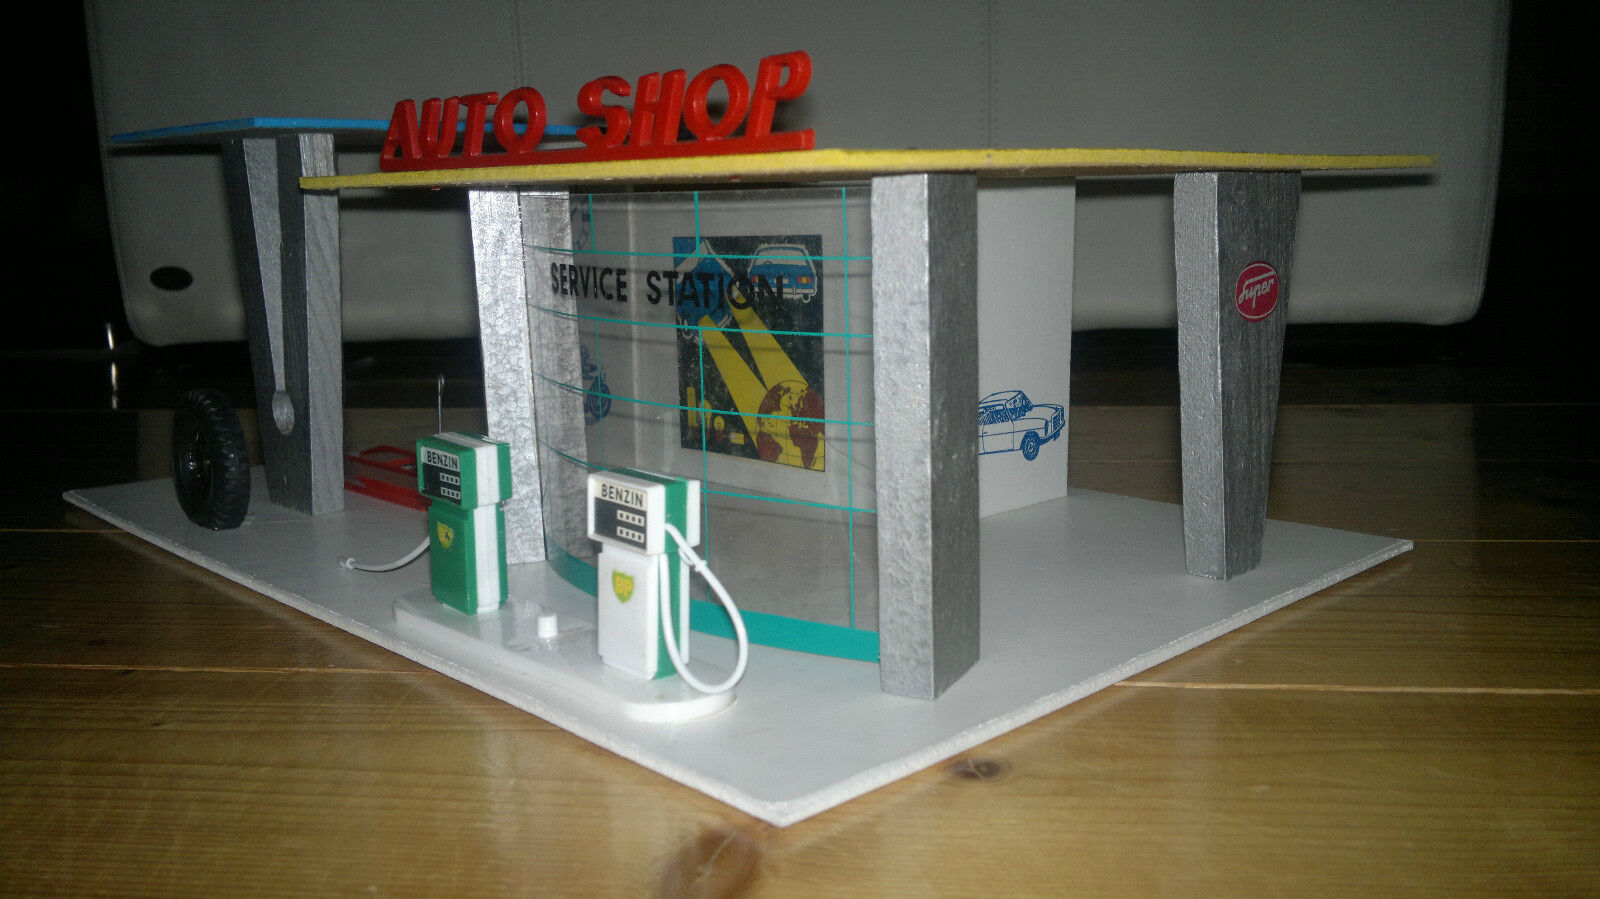 vero auto shop garage mit tankstelle holz spielzeug ddr export chf picclick ch. Black Bedroom Furniture Sets. Home Design Ideas